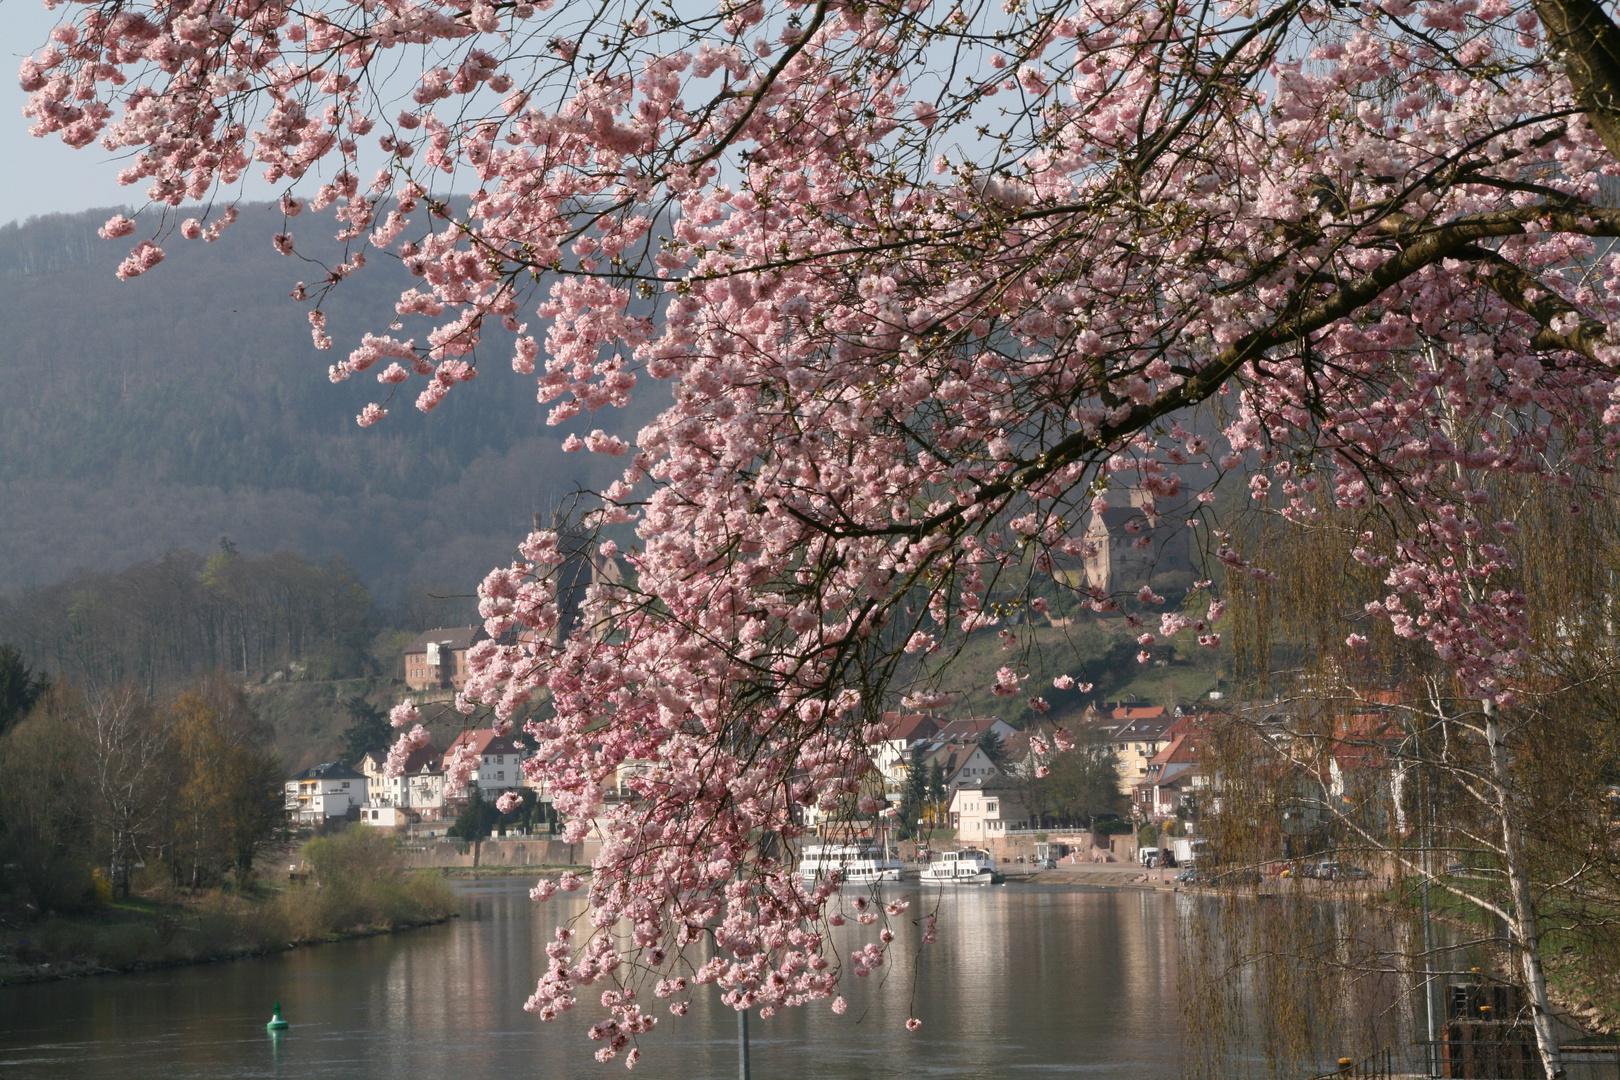 Wildkirsch-Blüten -Baum